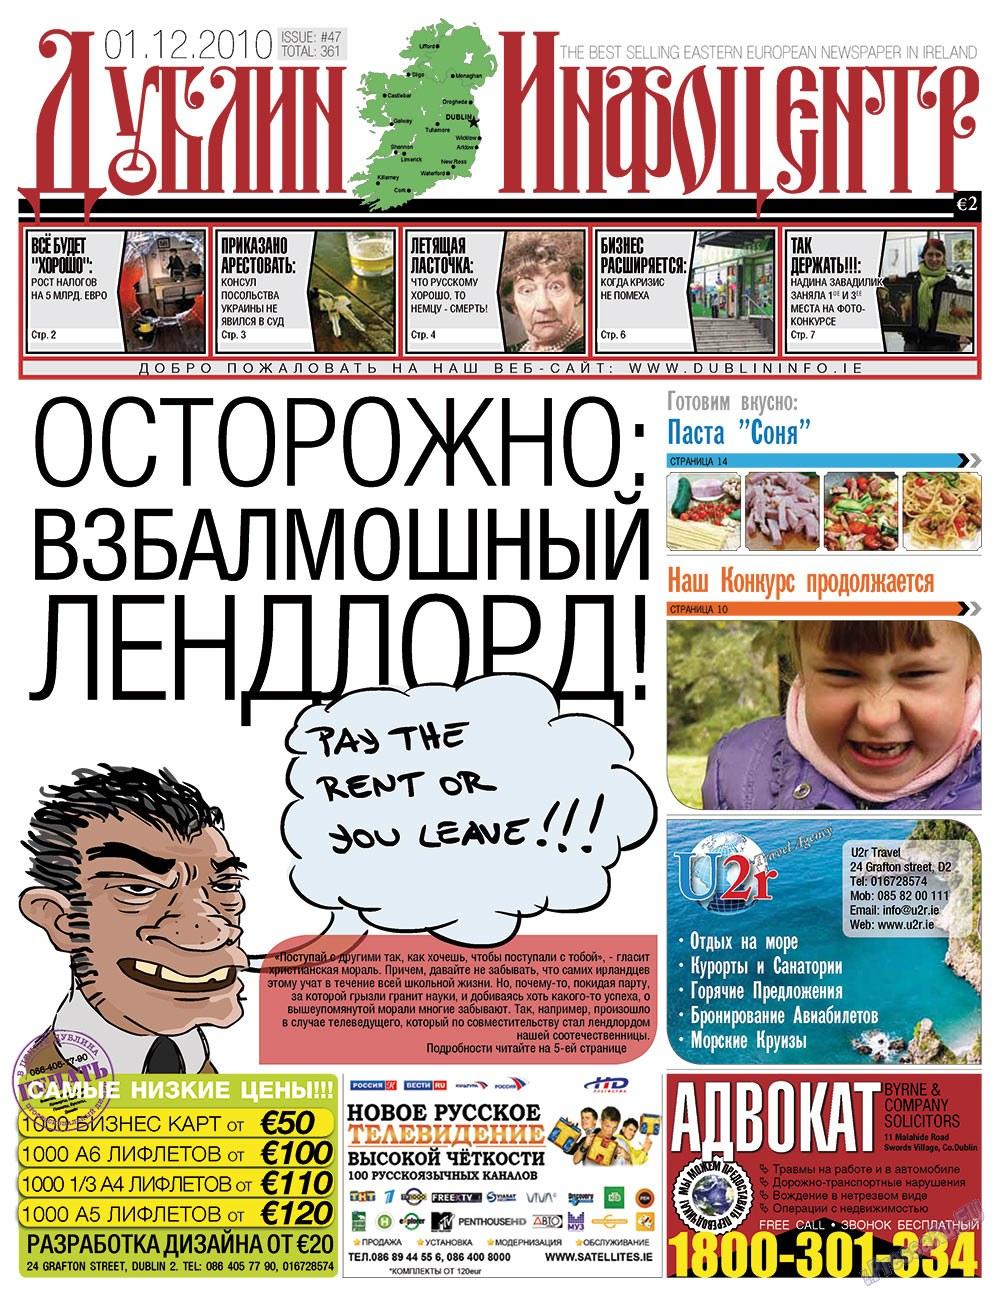 Дублин инфоцентр (газета). 2010 год, номер 47, стр. 1